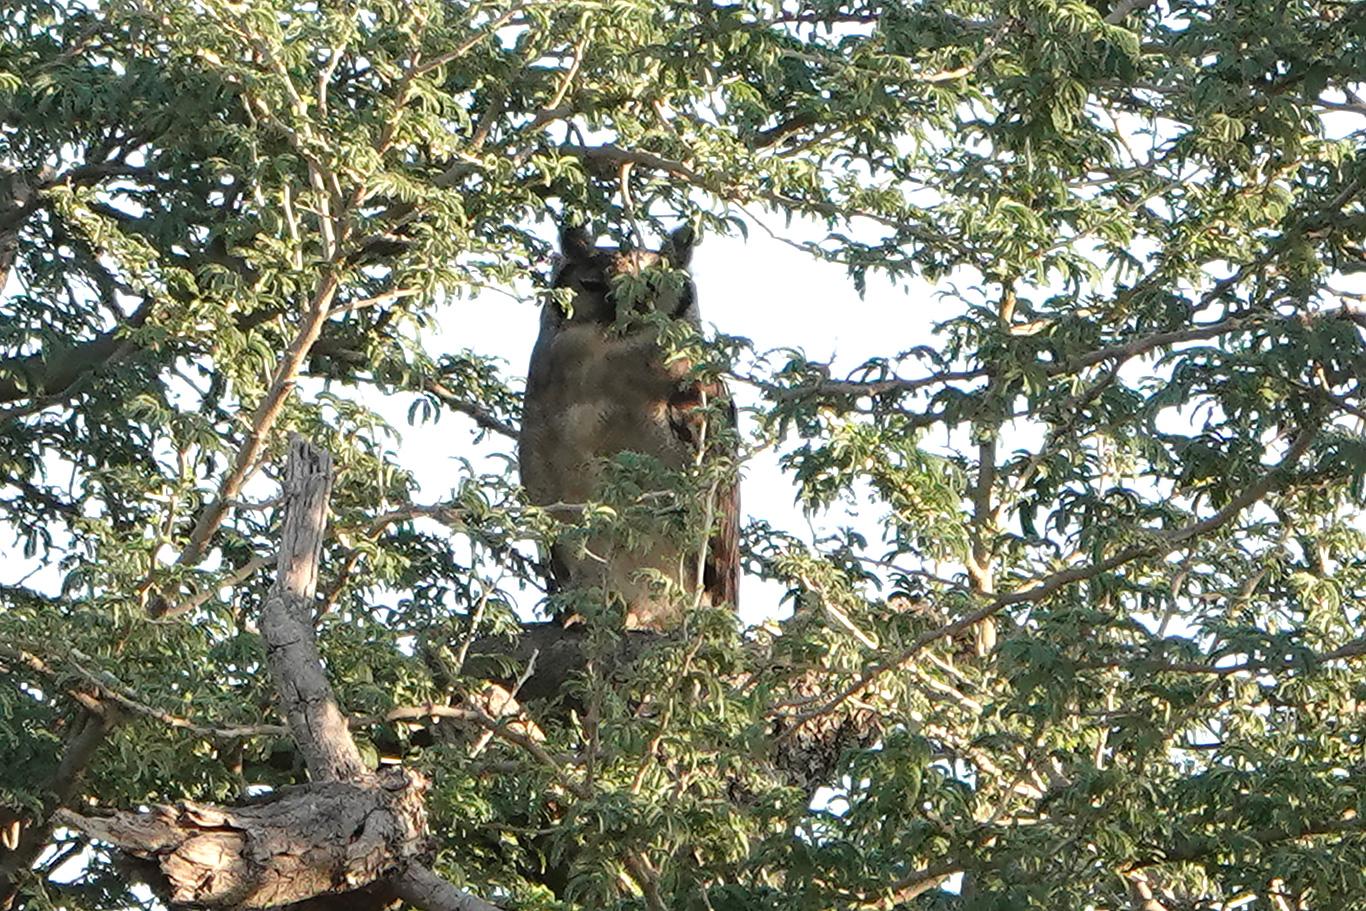 Verreaux's Eagle Owl, Near Farafenni, The Gambia.